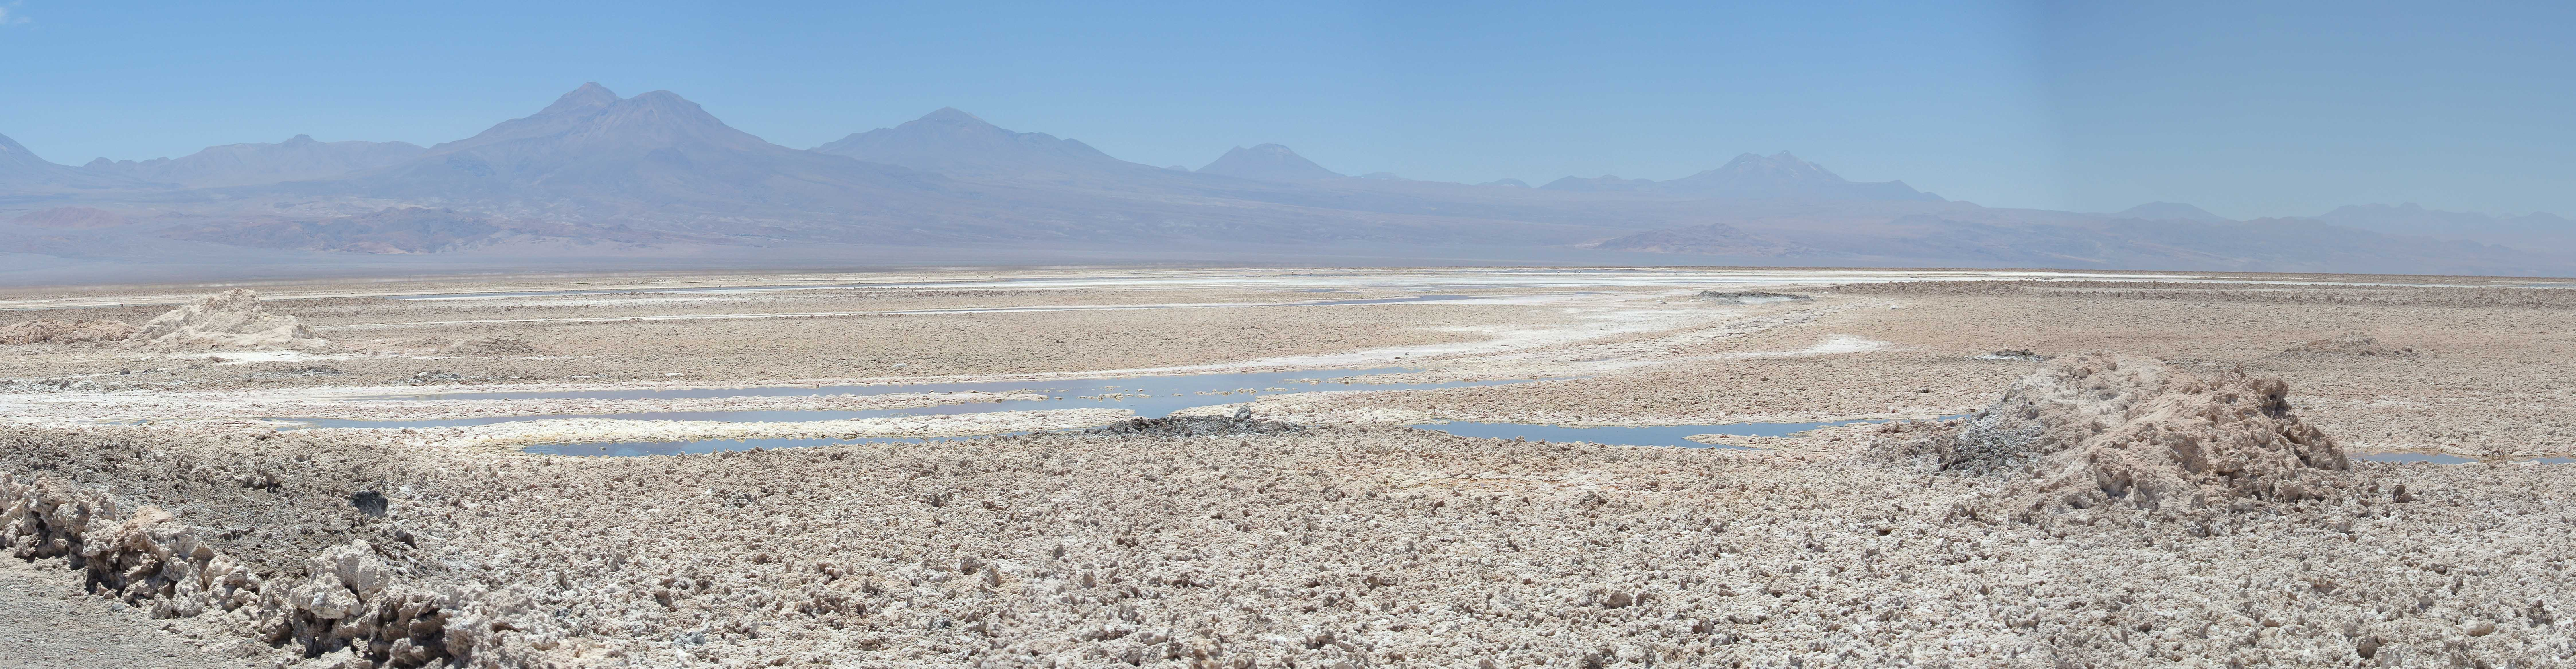 022 0912 Mirador - Salar de Atacama 90jpg